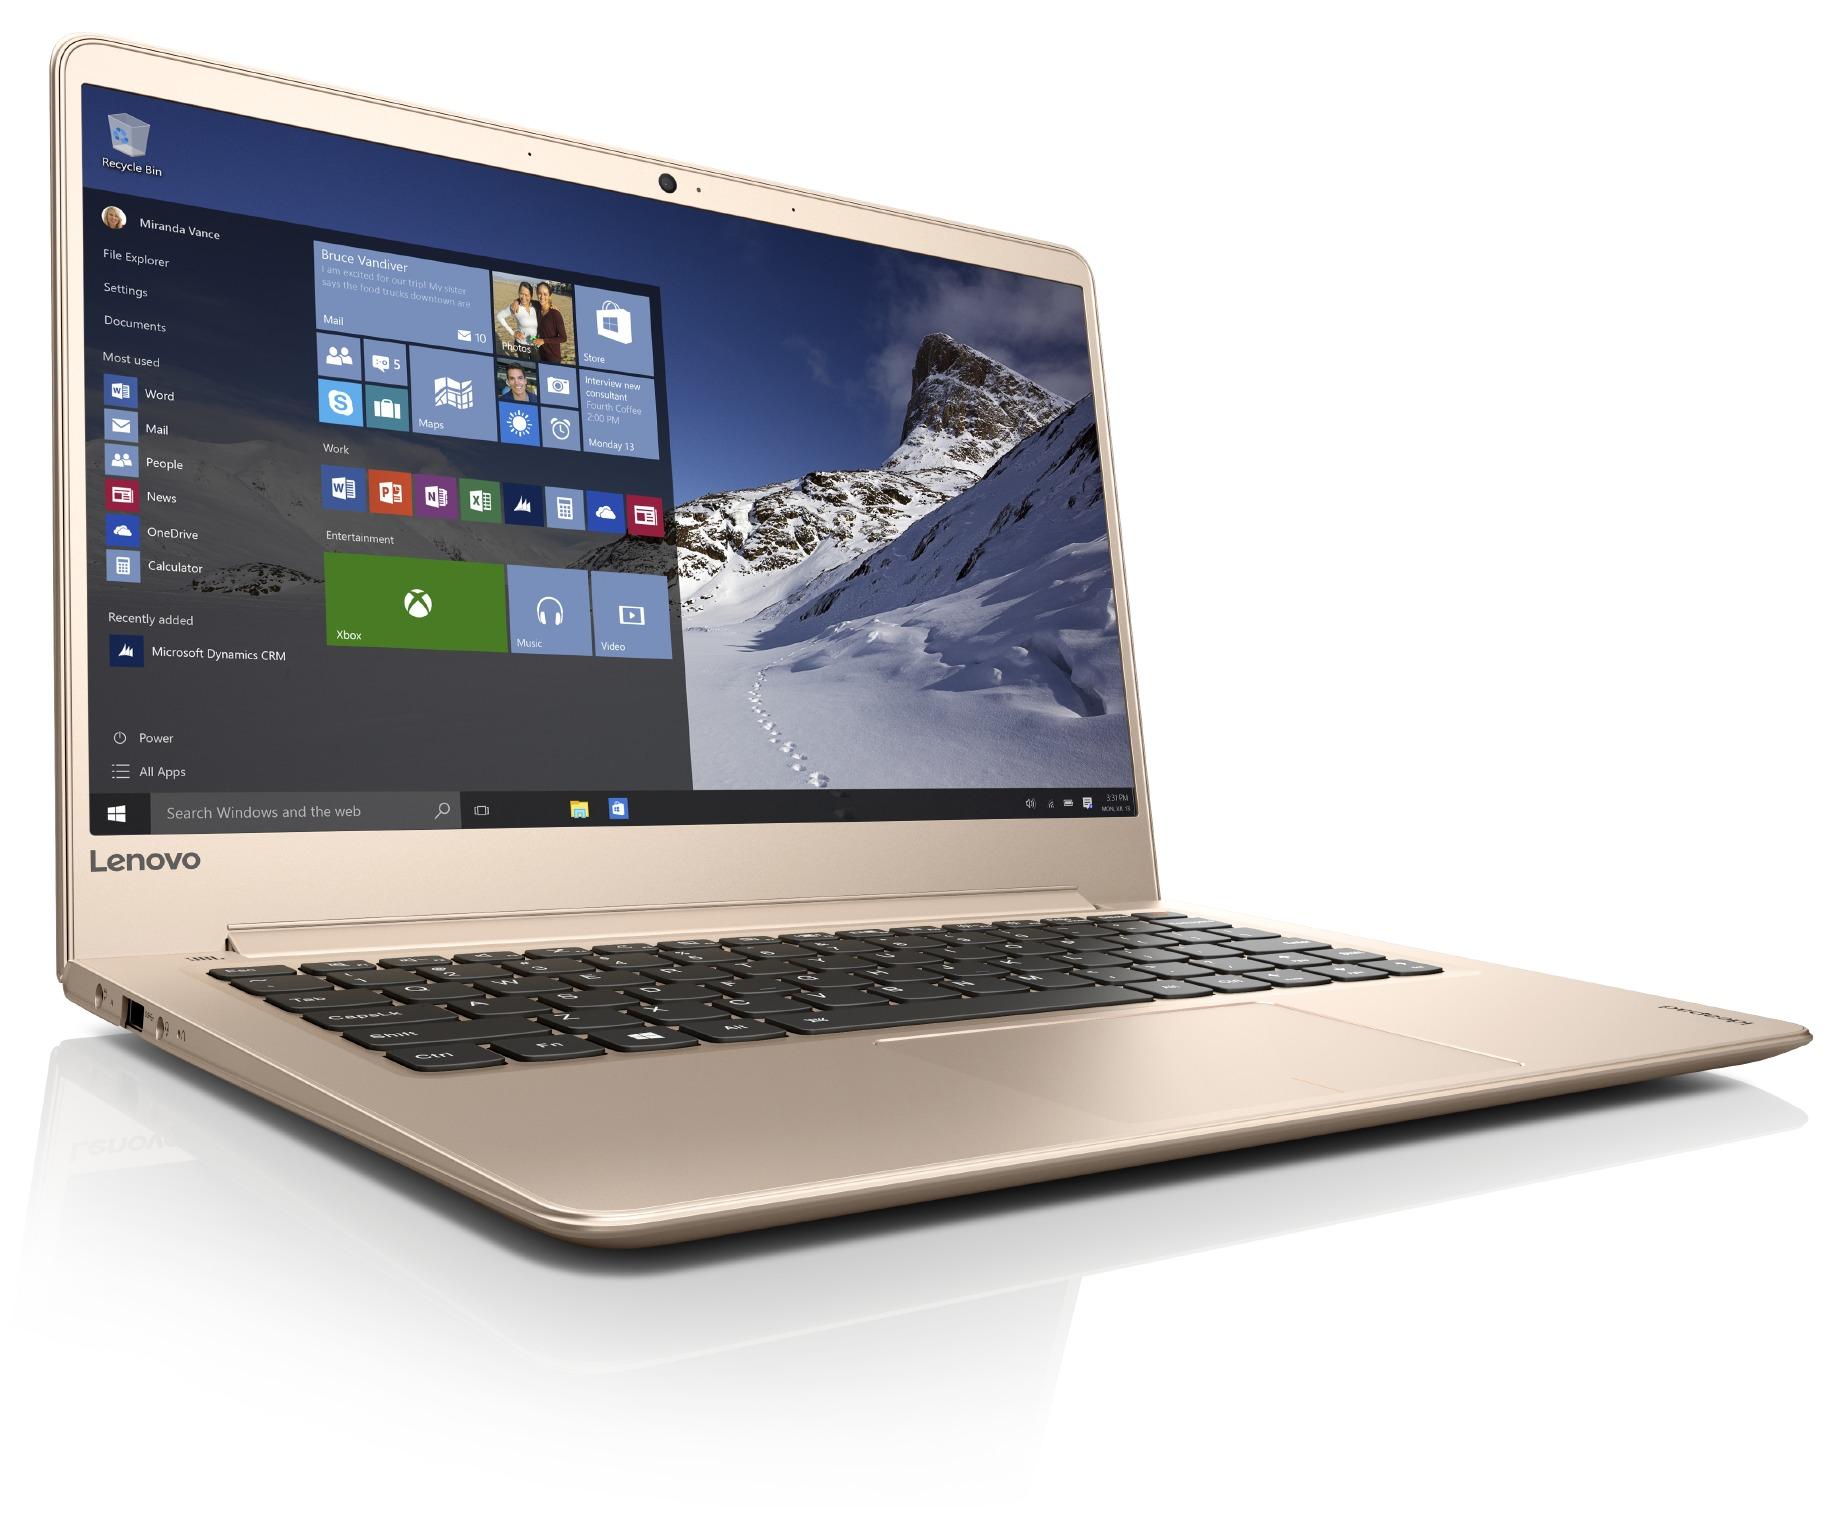 "Lenovo IdeaPad 710S PLUS-13IKB i5-7200U 3,10GHz/8GB/SSD 256GB/13,3"" FHD/IPS/AG/FPR/WIN10 PRO zlatá 80W3003RCK"